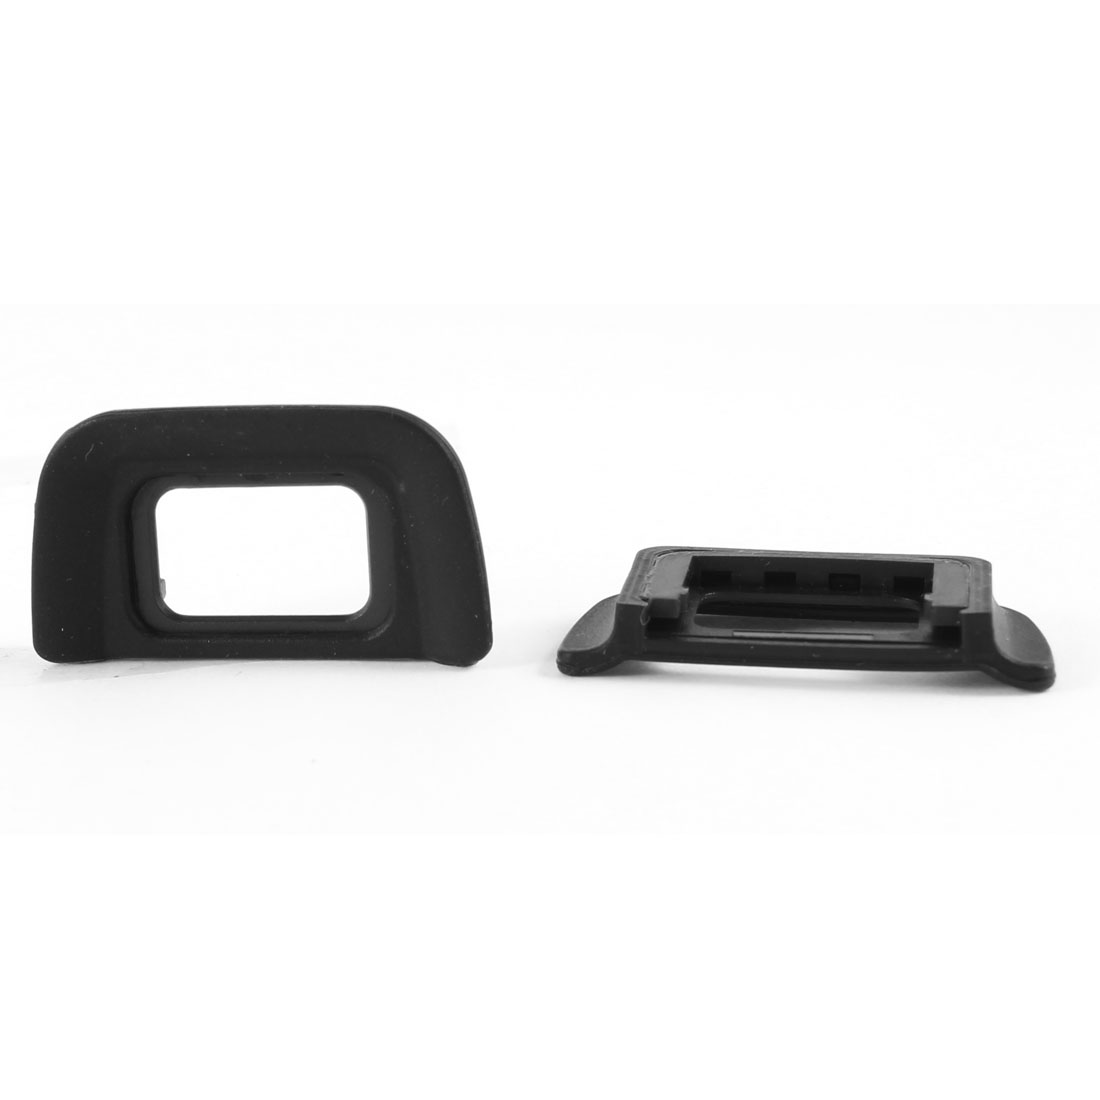 2 Pcs DK-20 Rubber Eyepiece Eyecup Eg for DSLR Camera